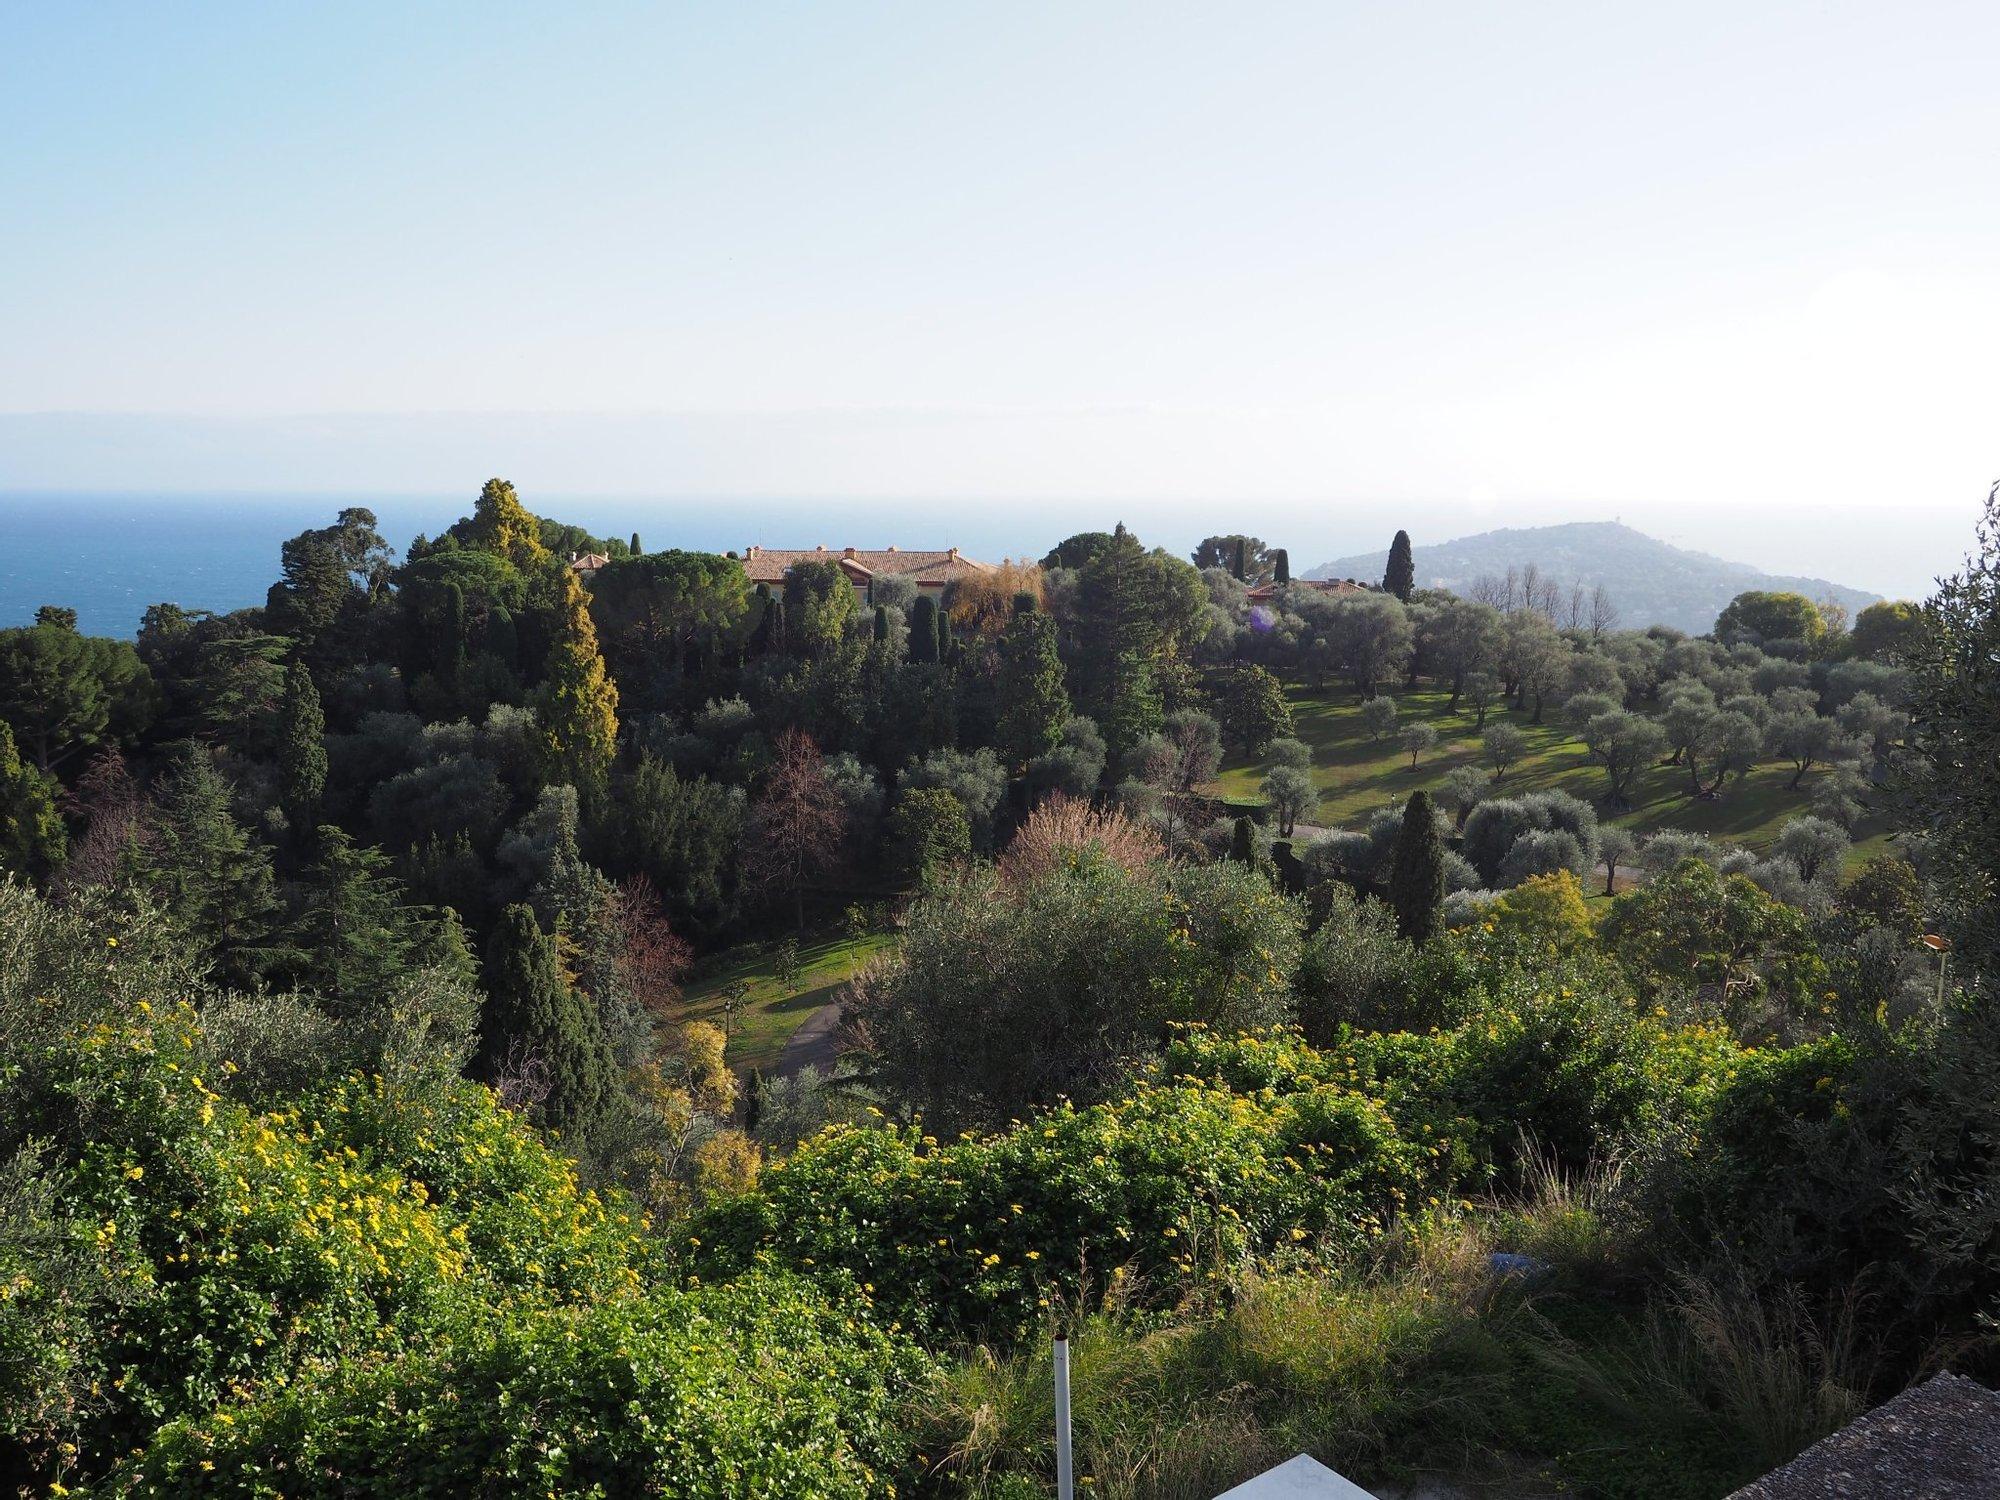 Land in Villefranche-sur-Mer, Provence-Alpes-Côte d'Azur, France 1